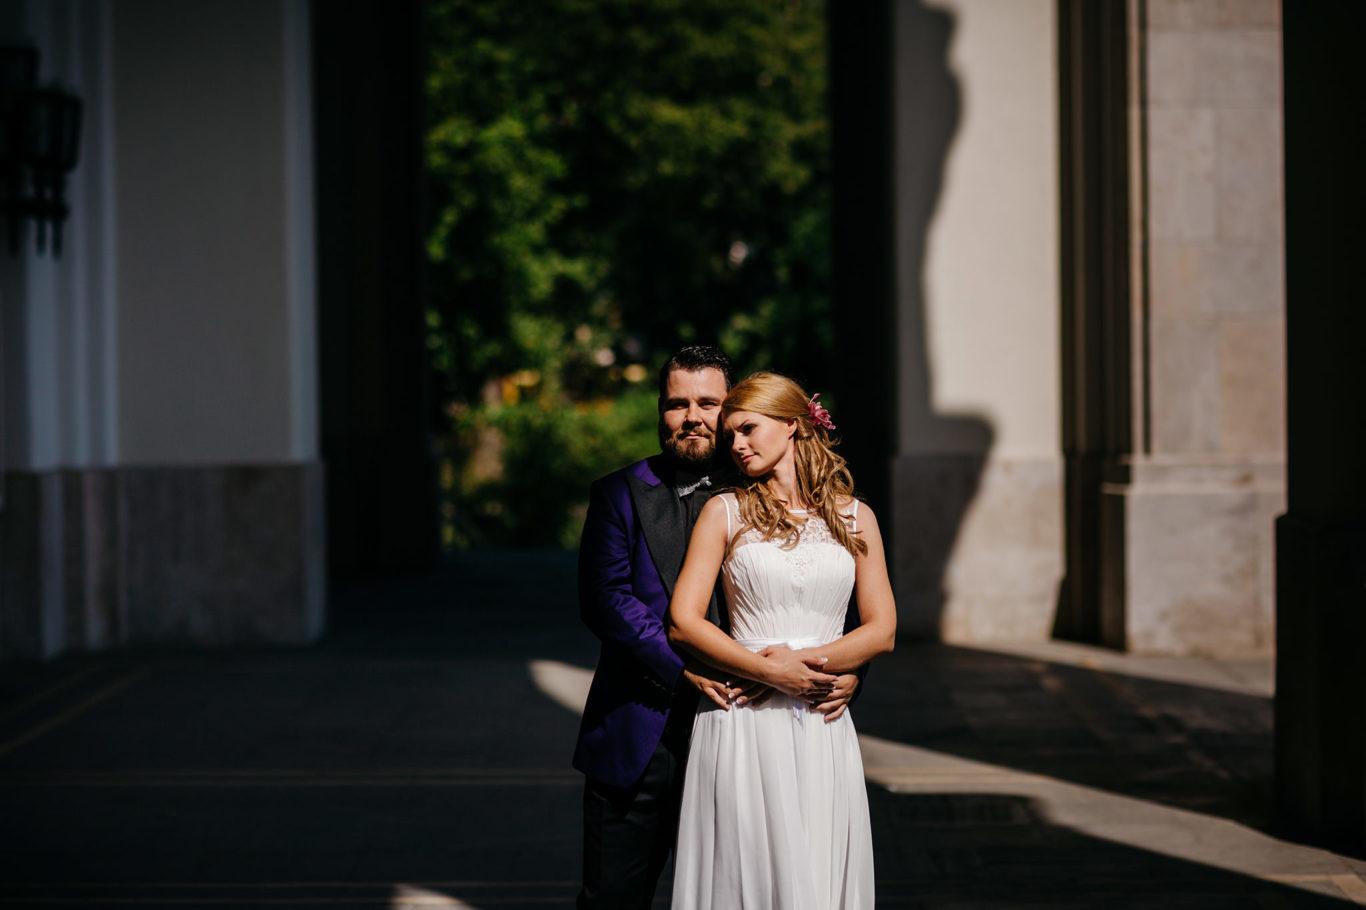 0136-fotografie-nunta-bucuresti-rodica-rares-fotograf-ciprian-dumitrescu-cd2_0003-2